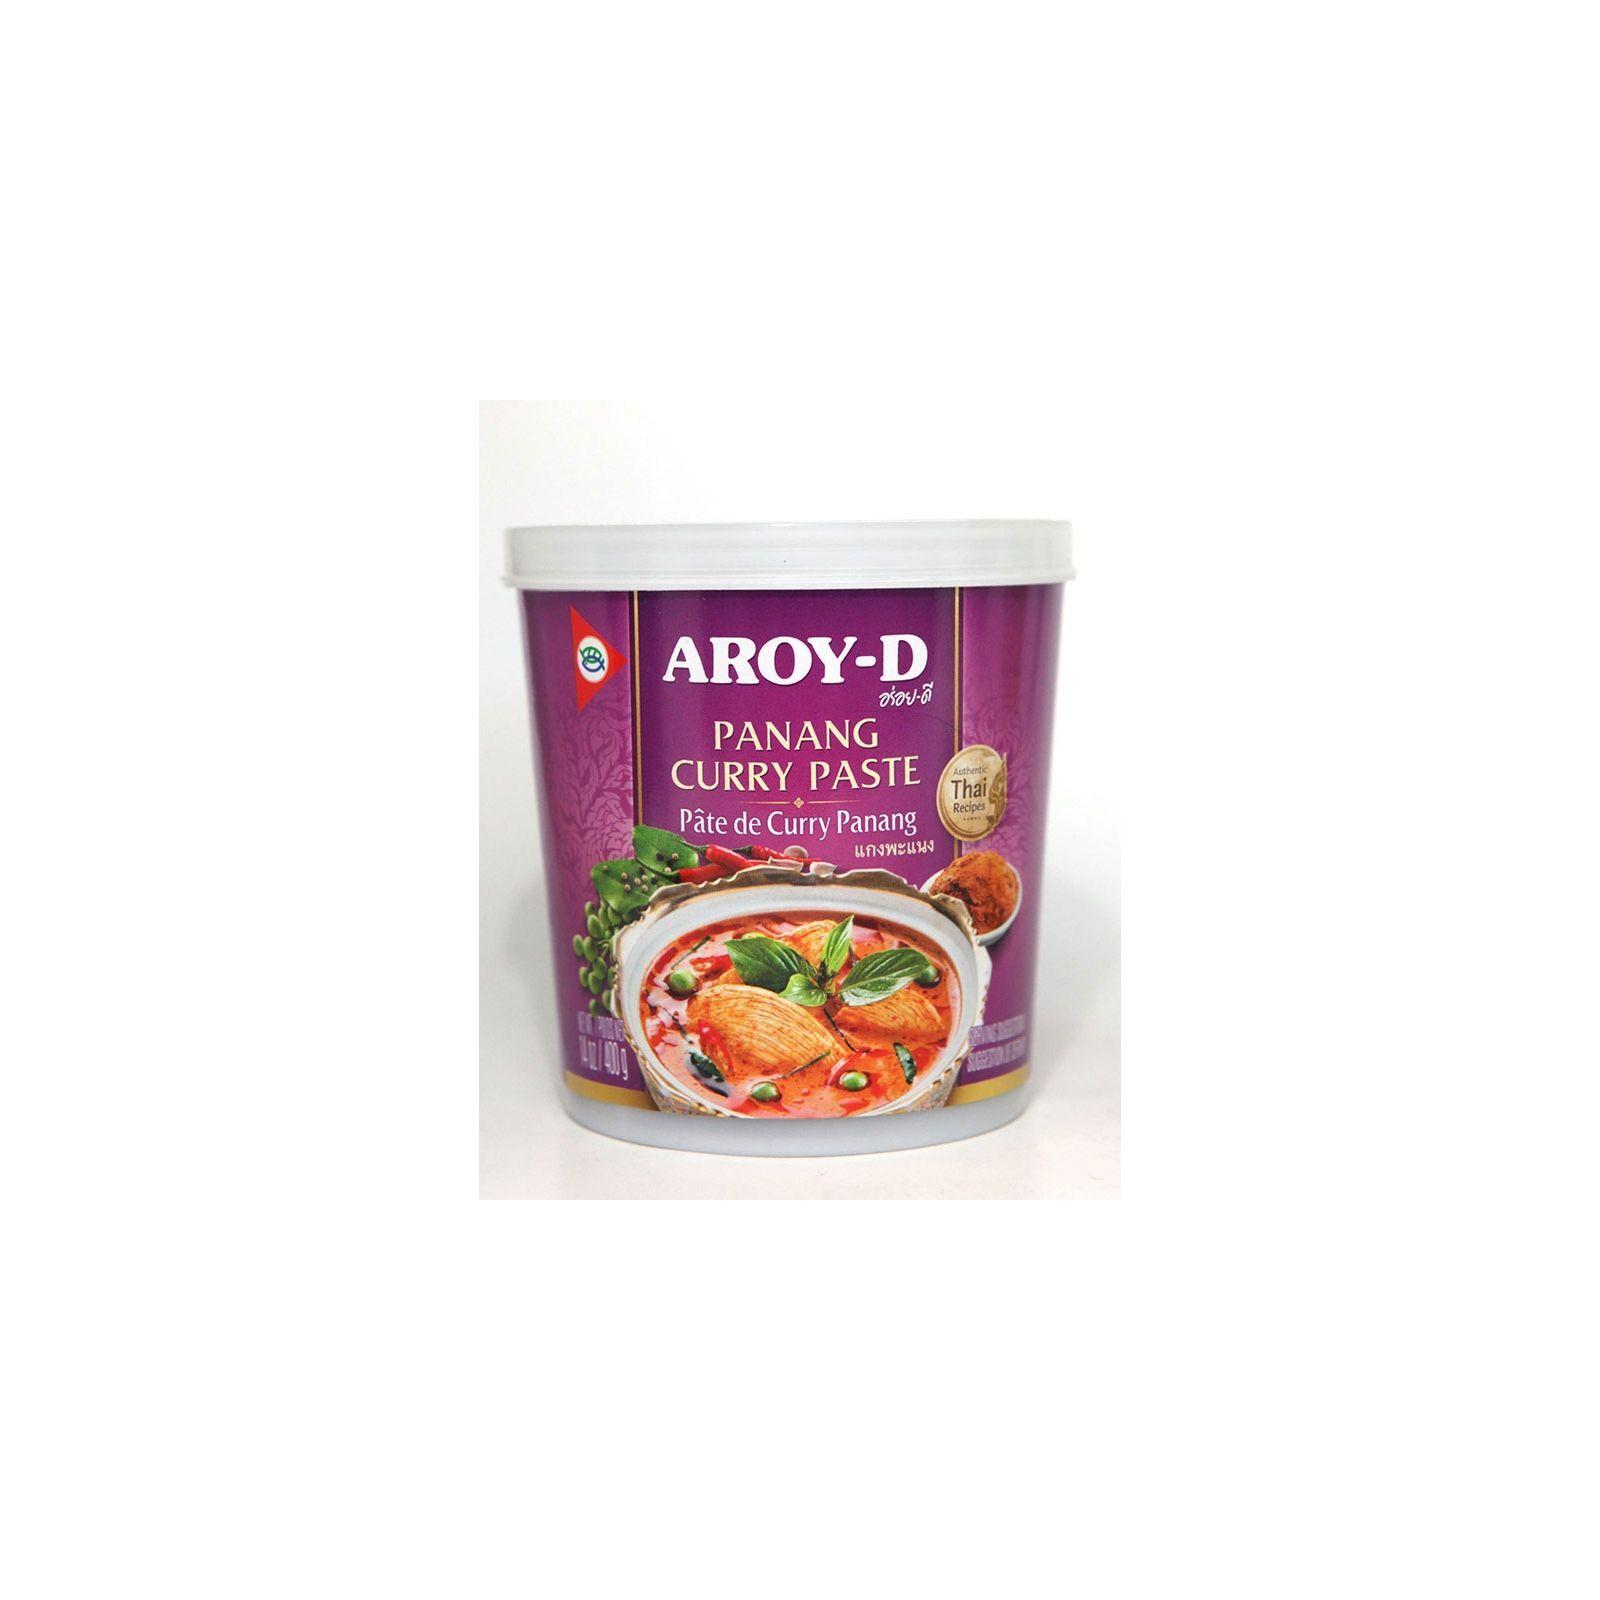 Asia Marché Pâte de curry Panang 400g Aroy-D